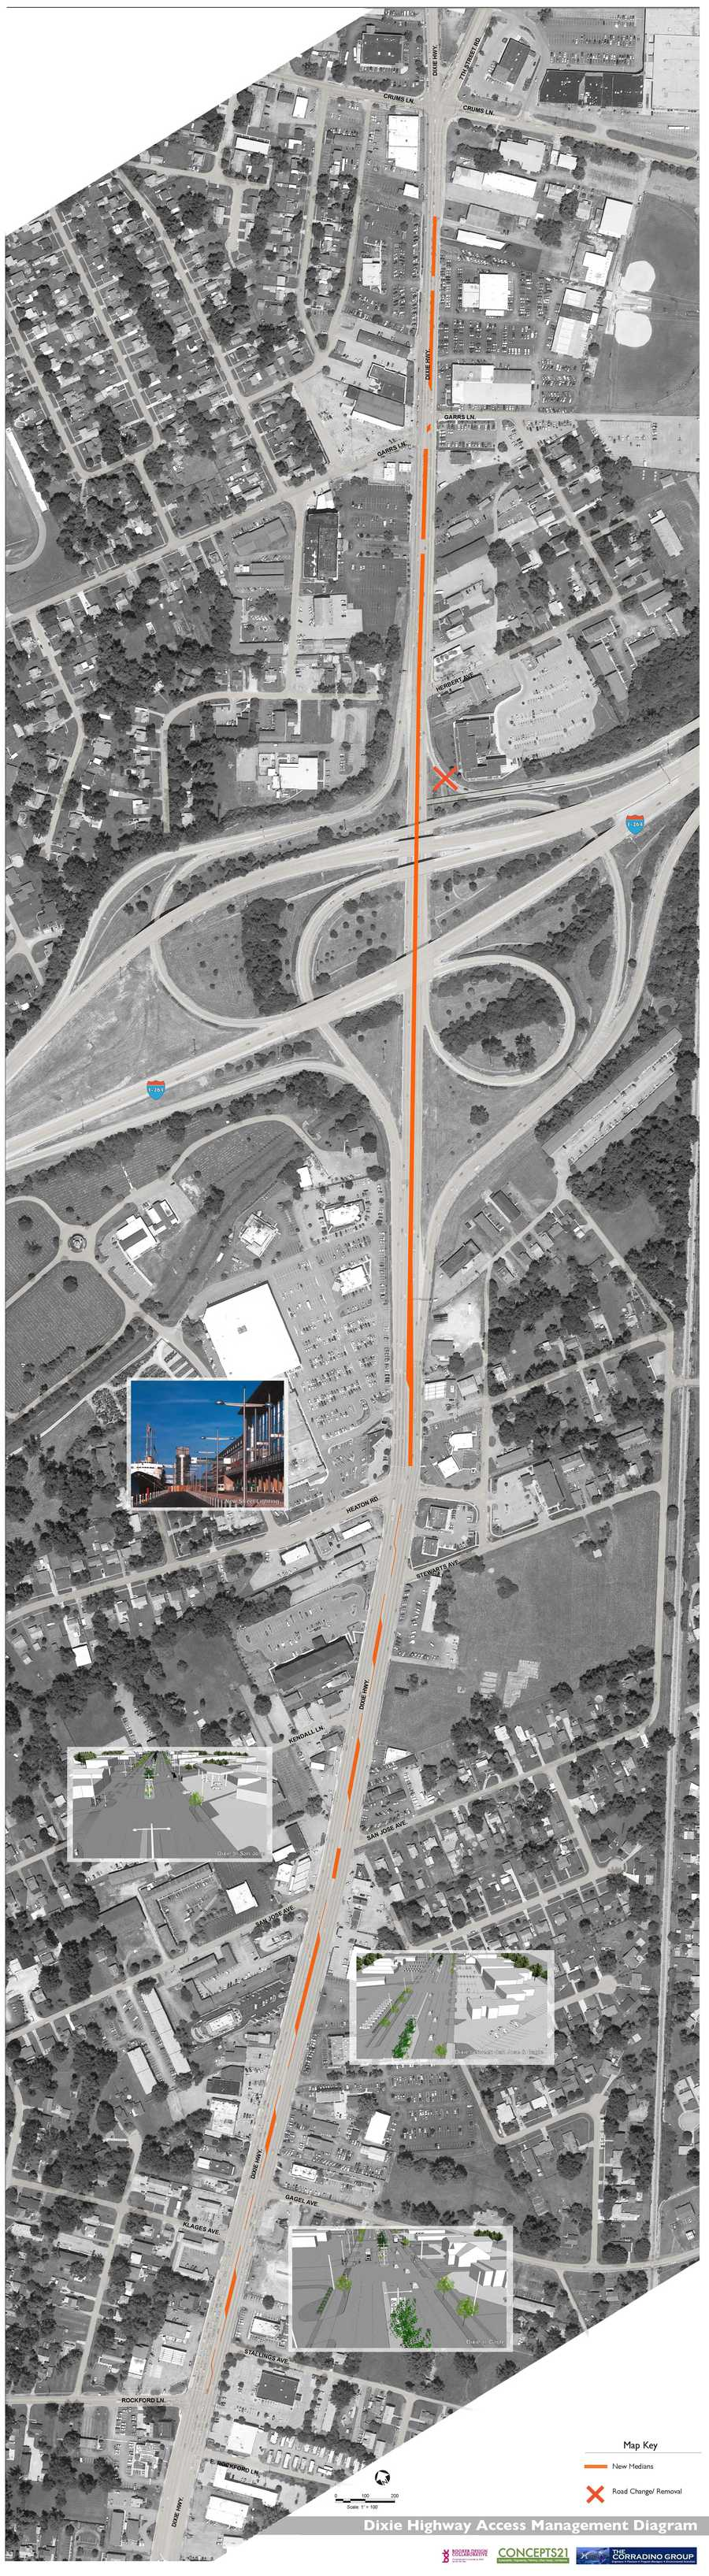 Dixie Highway Access Management Diagram